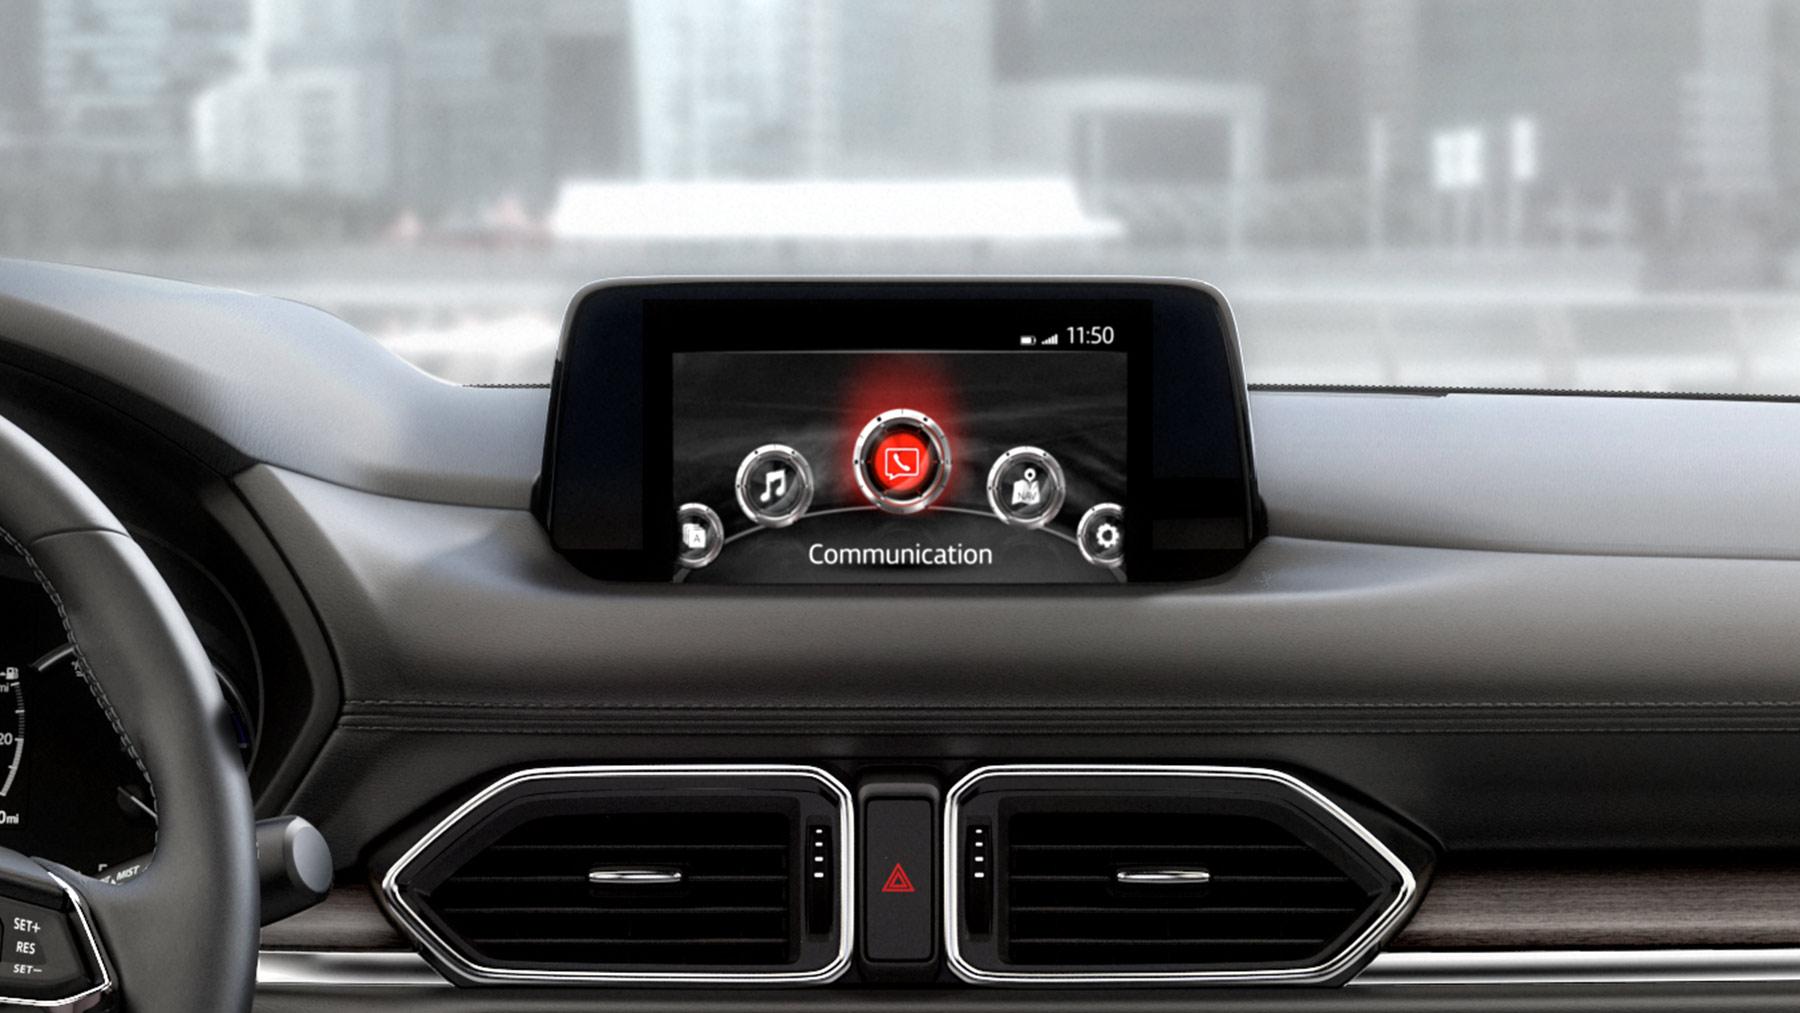 Touchscreen in the Mazda CX-5